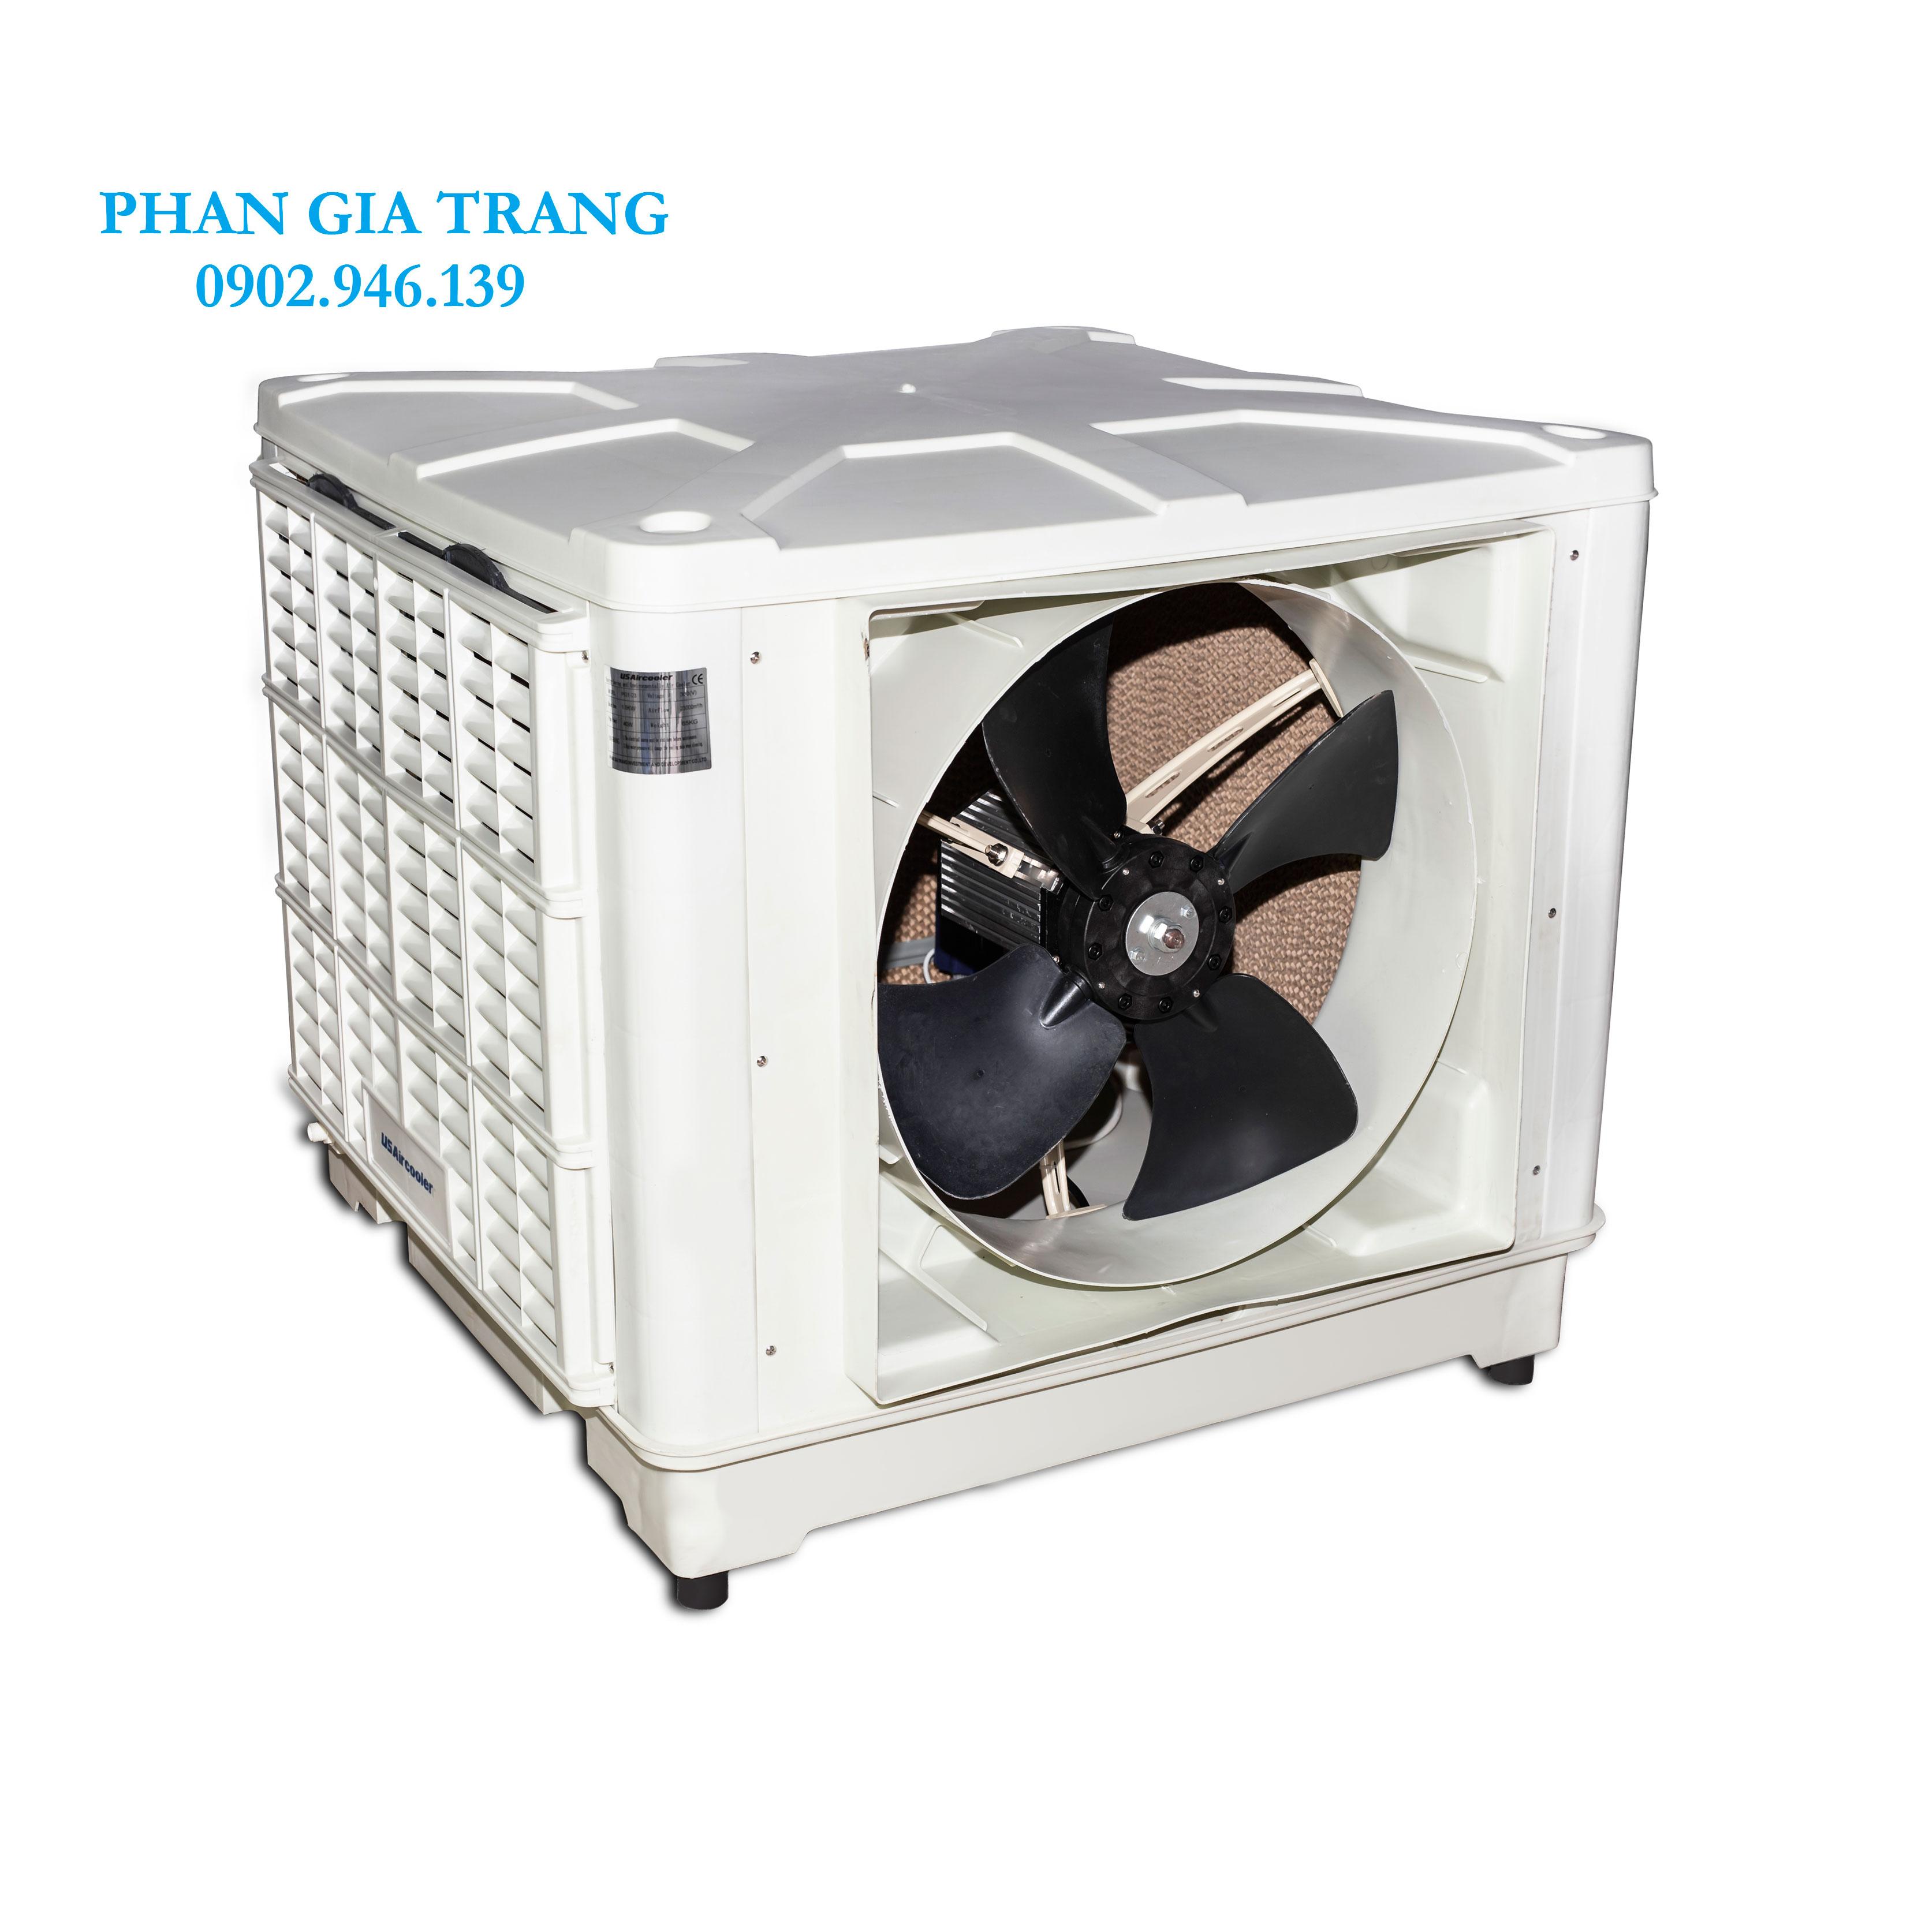 PGT 18000 Miệng Ngang